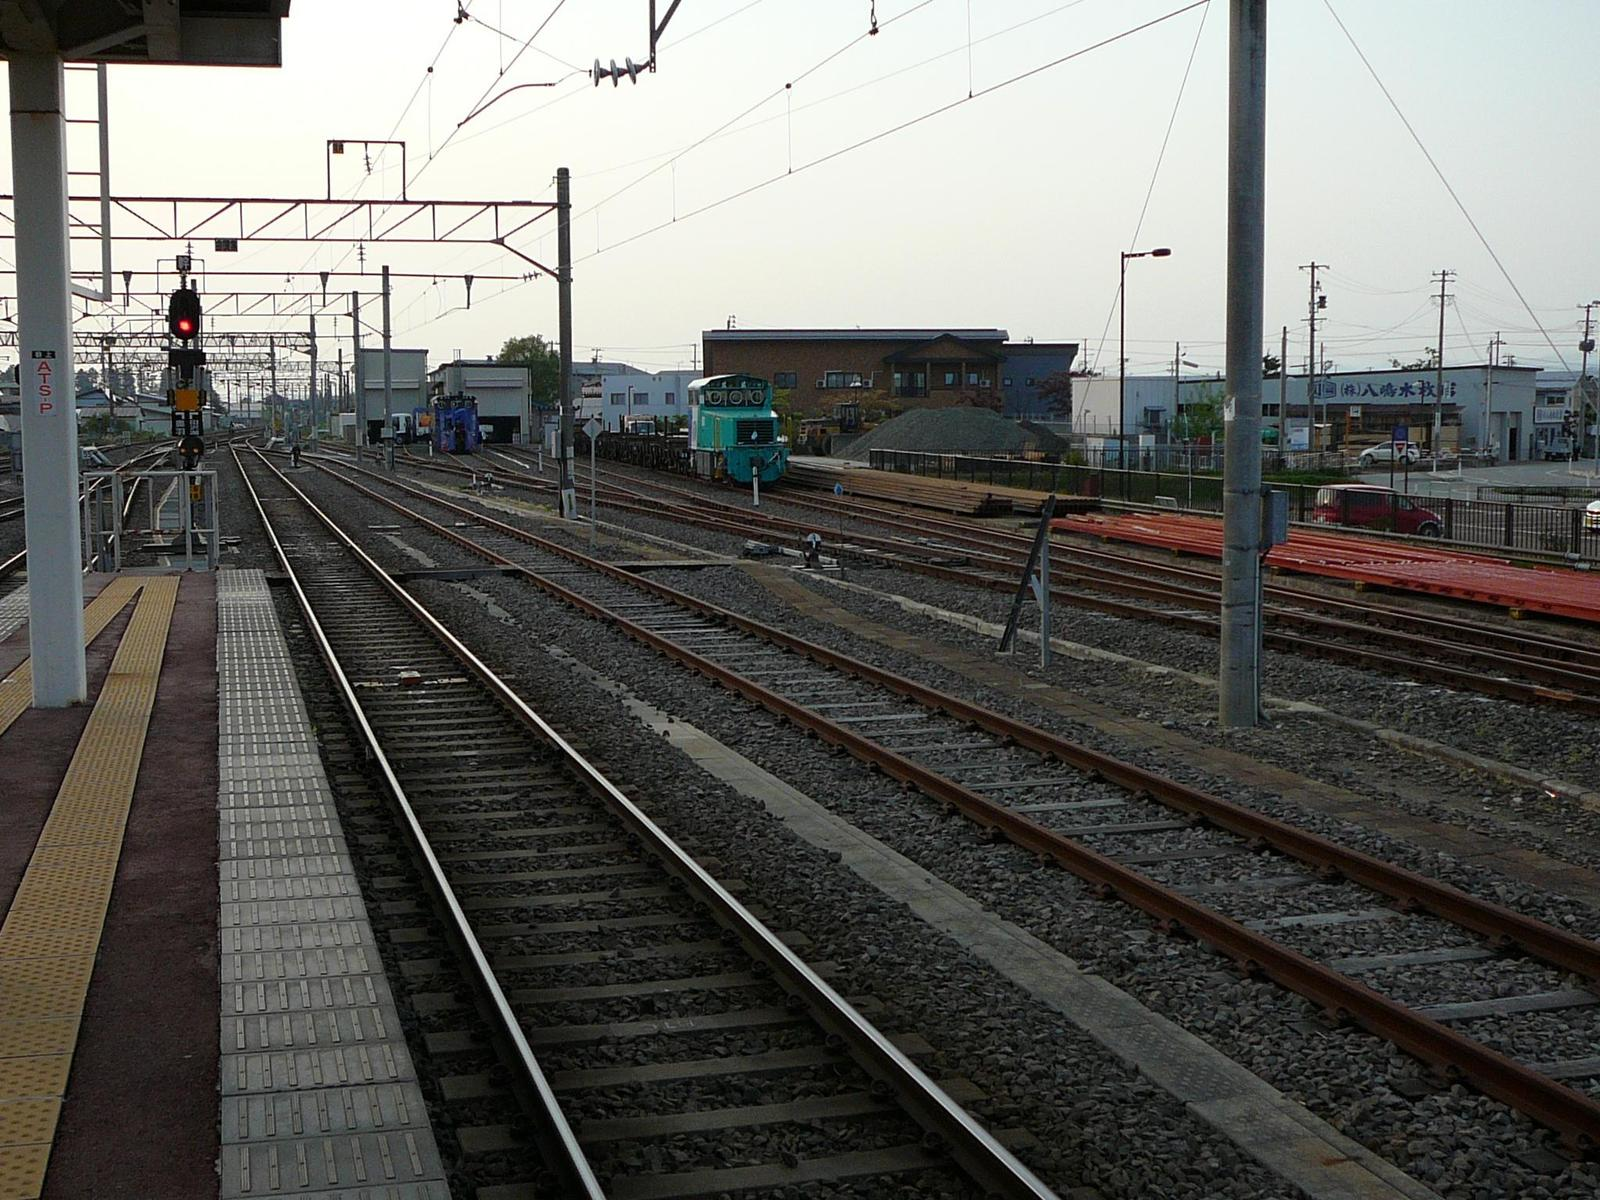 Dp1010352